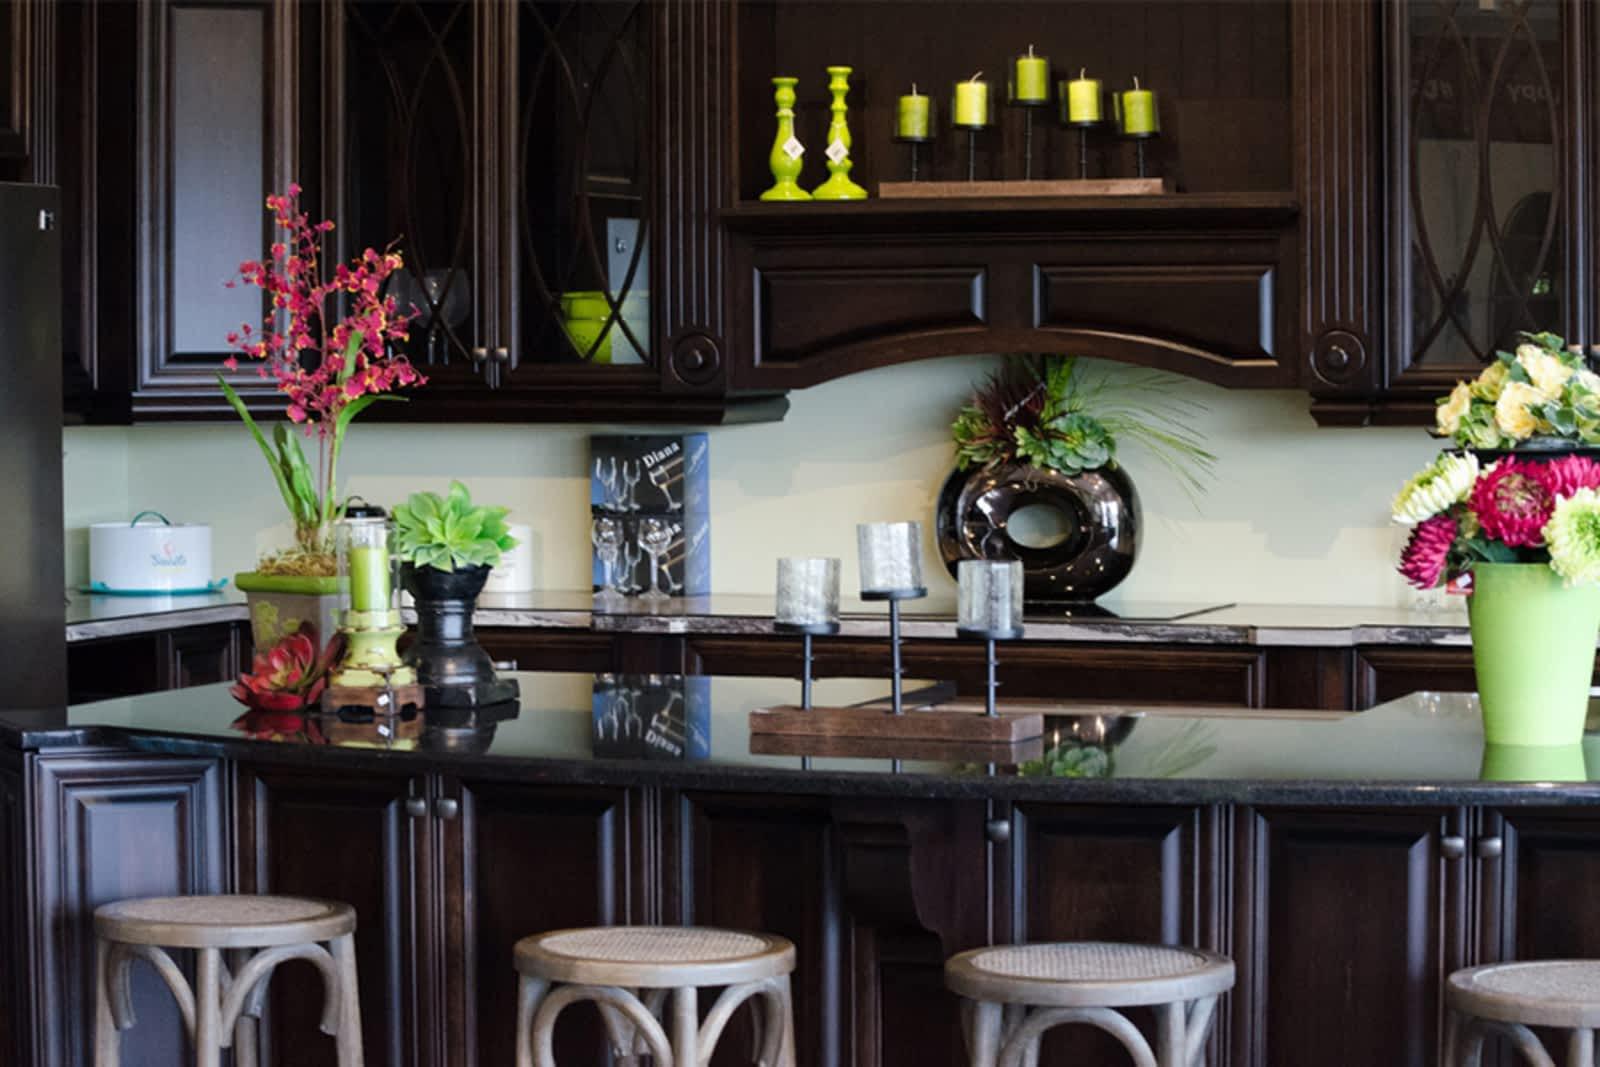 Prestige Kitchens Ltd - Opening Hours - 595 Read Dr, Summerside, PE